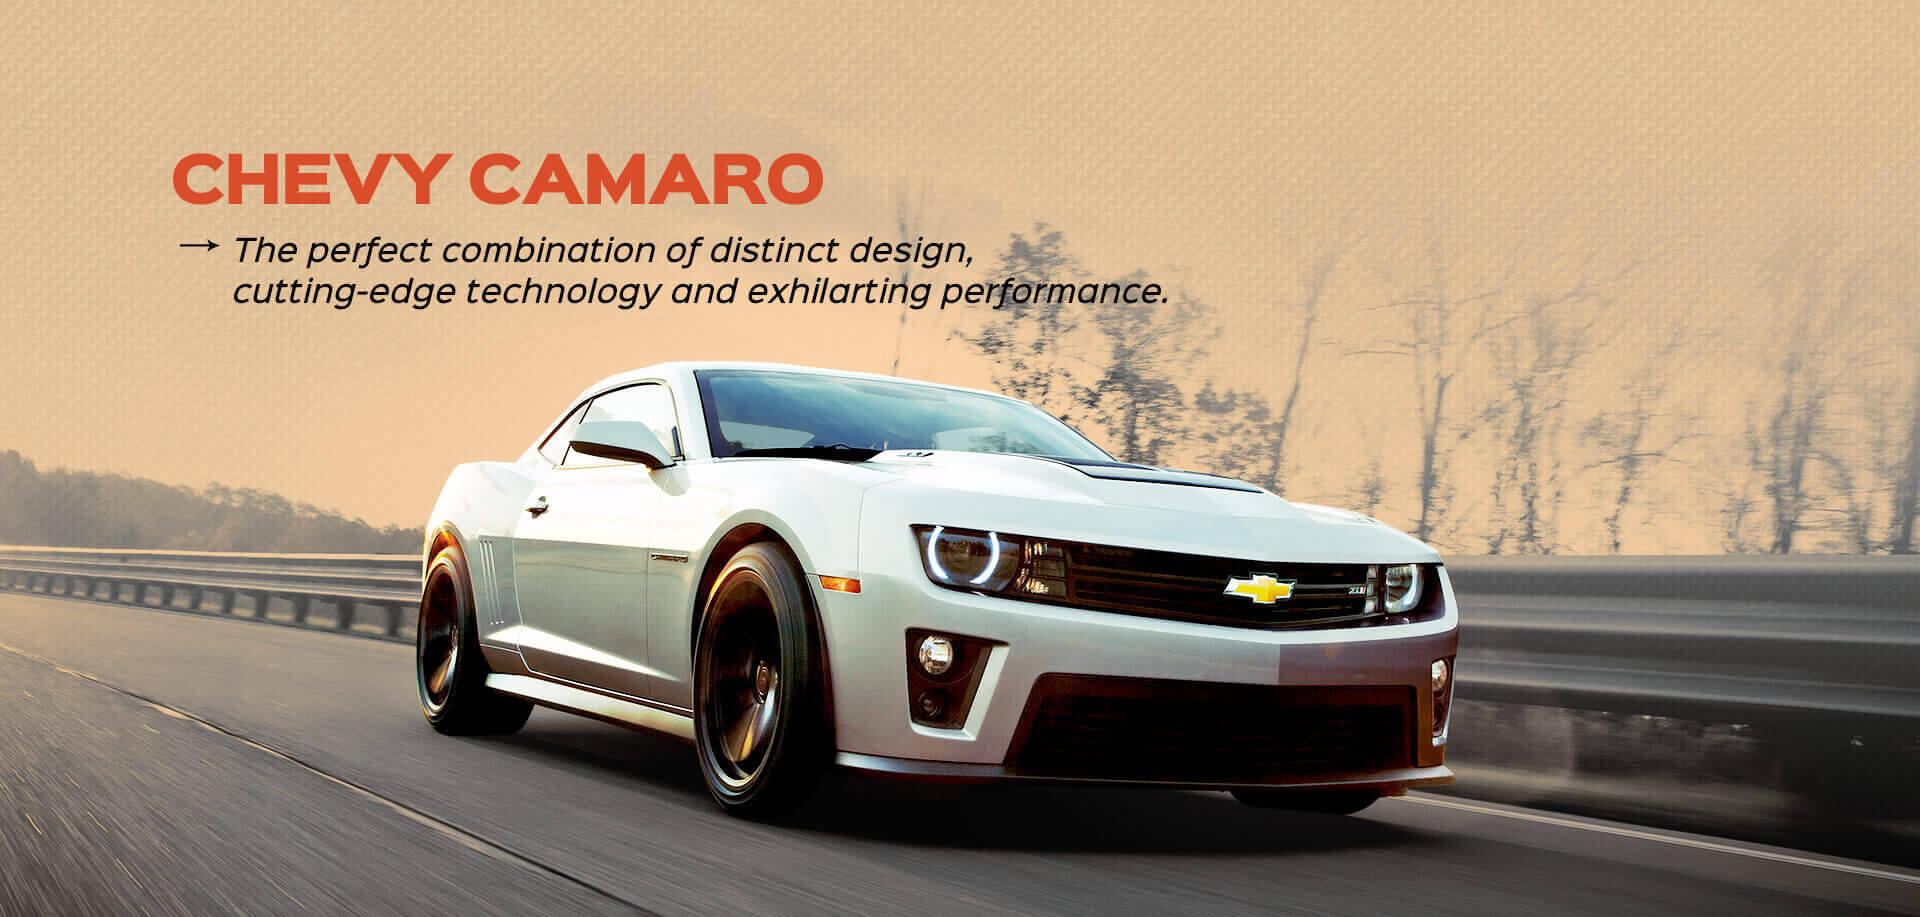 Canned Camaro